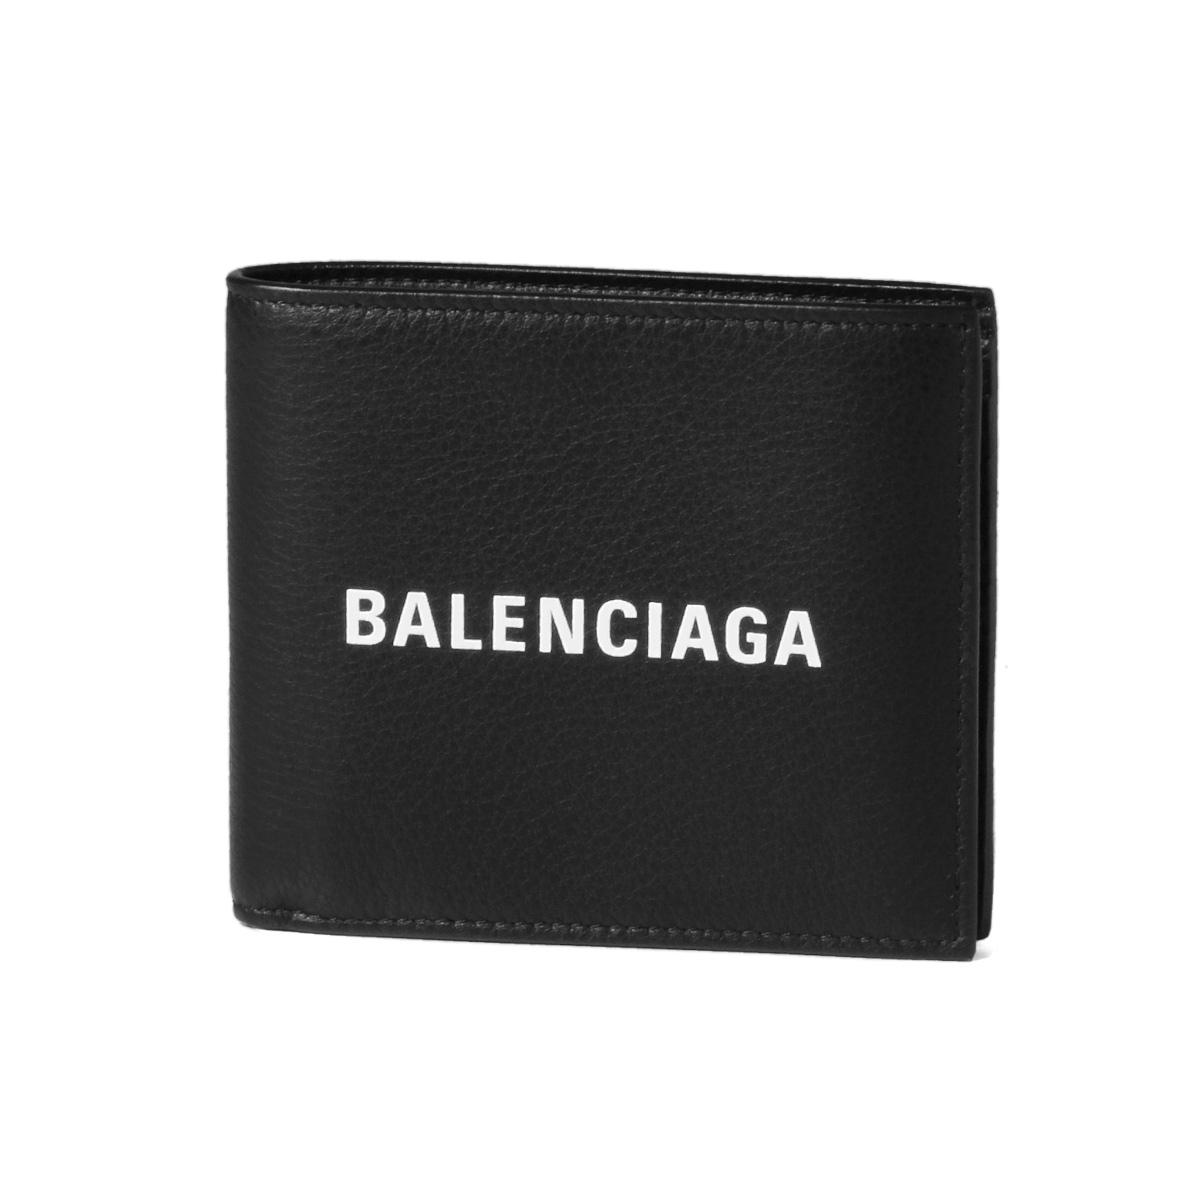 89ad0ed0 485108 バレンシアガ BALENCIAGA wallet men DLQHN 1060 folio wallet EVERYDAY  everyday NOIR/L BLANC black